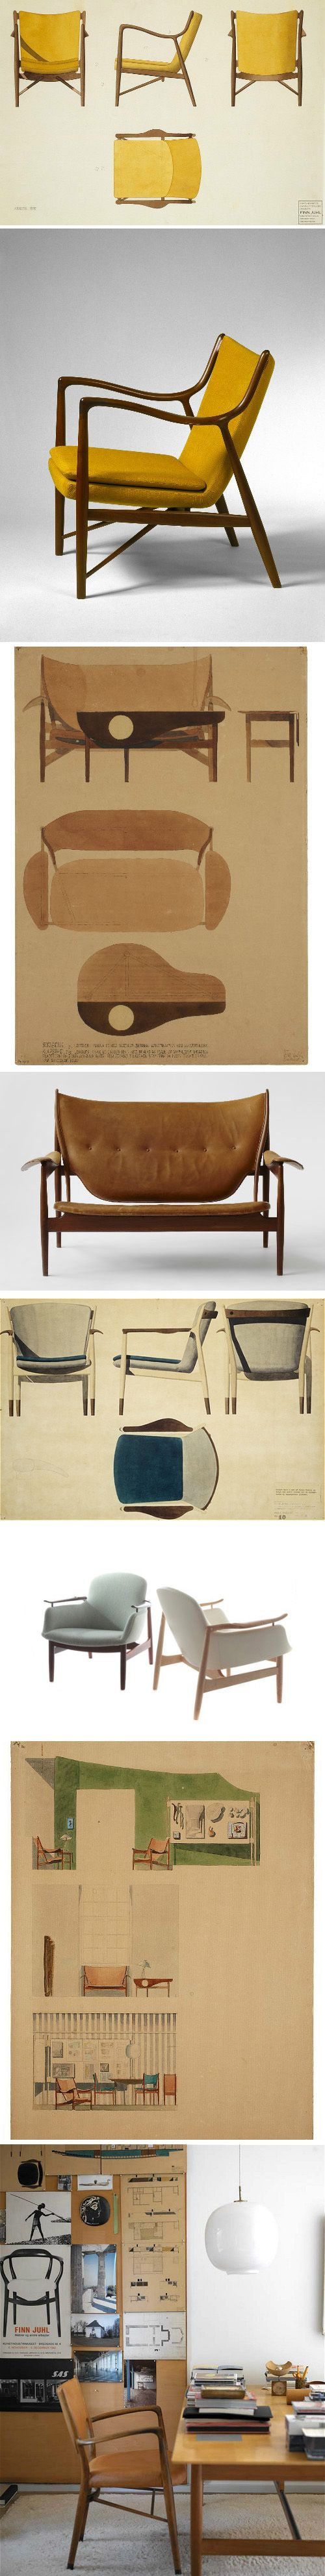 262 best furniture images on Pinterest